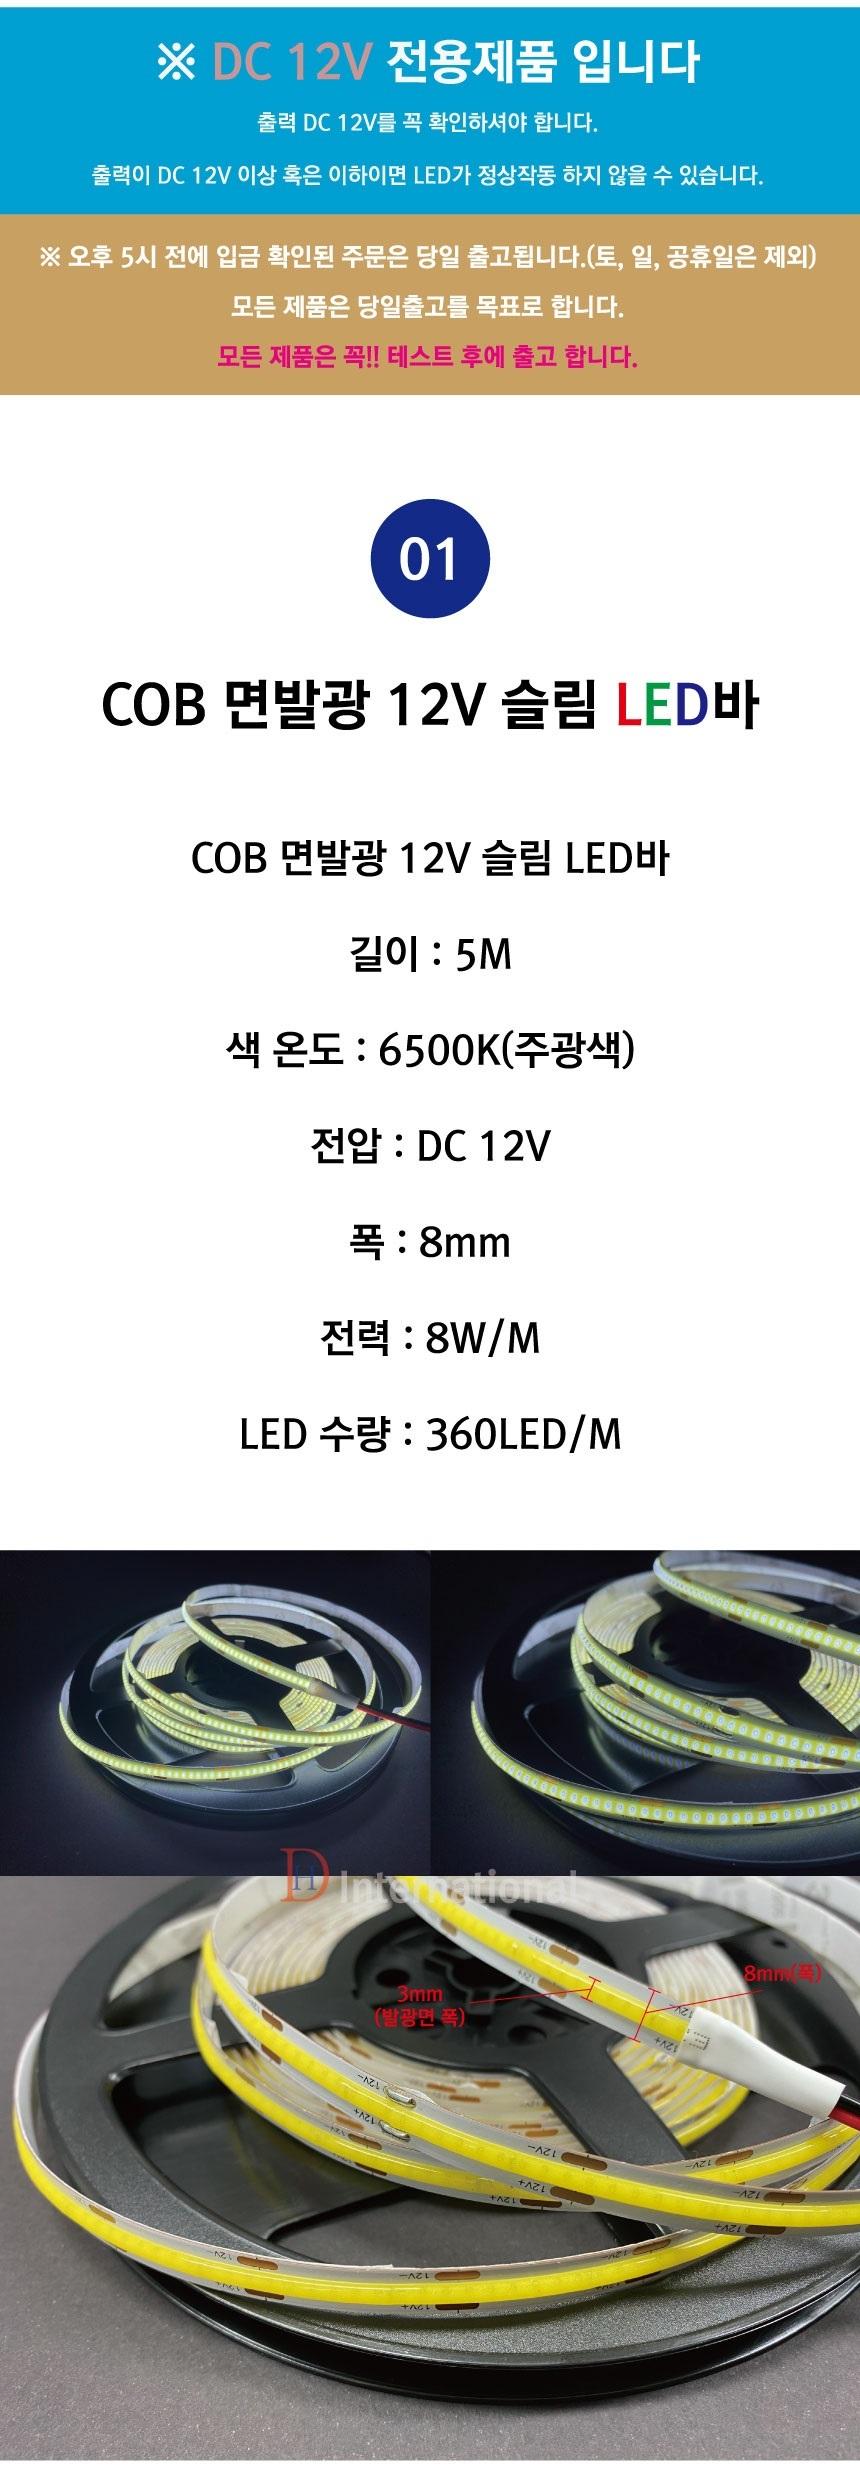 COB-LED-360LED-8mm-6500K-%EC%83%81%ED%92